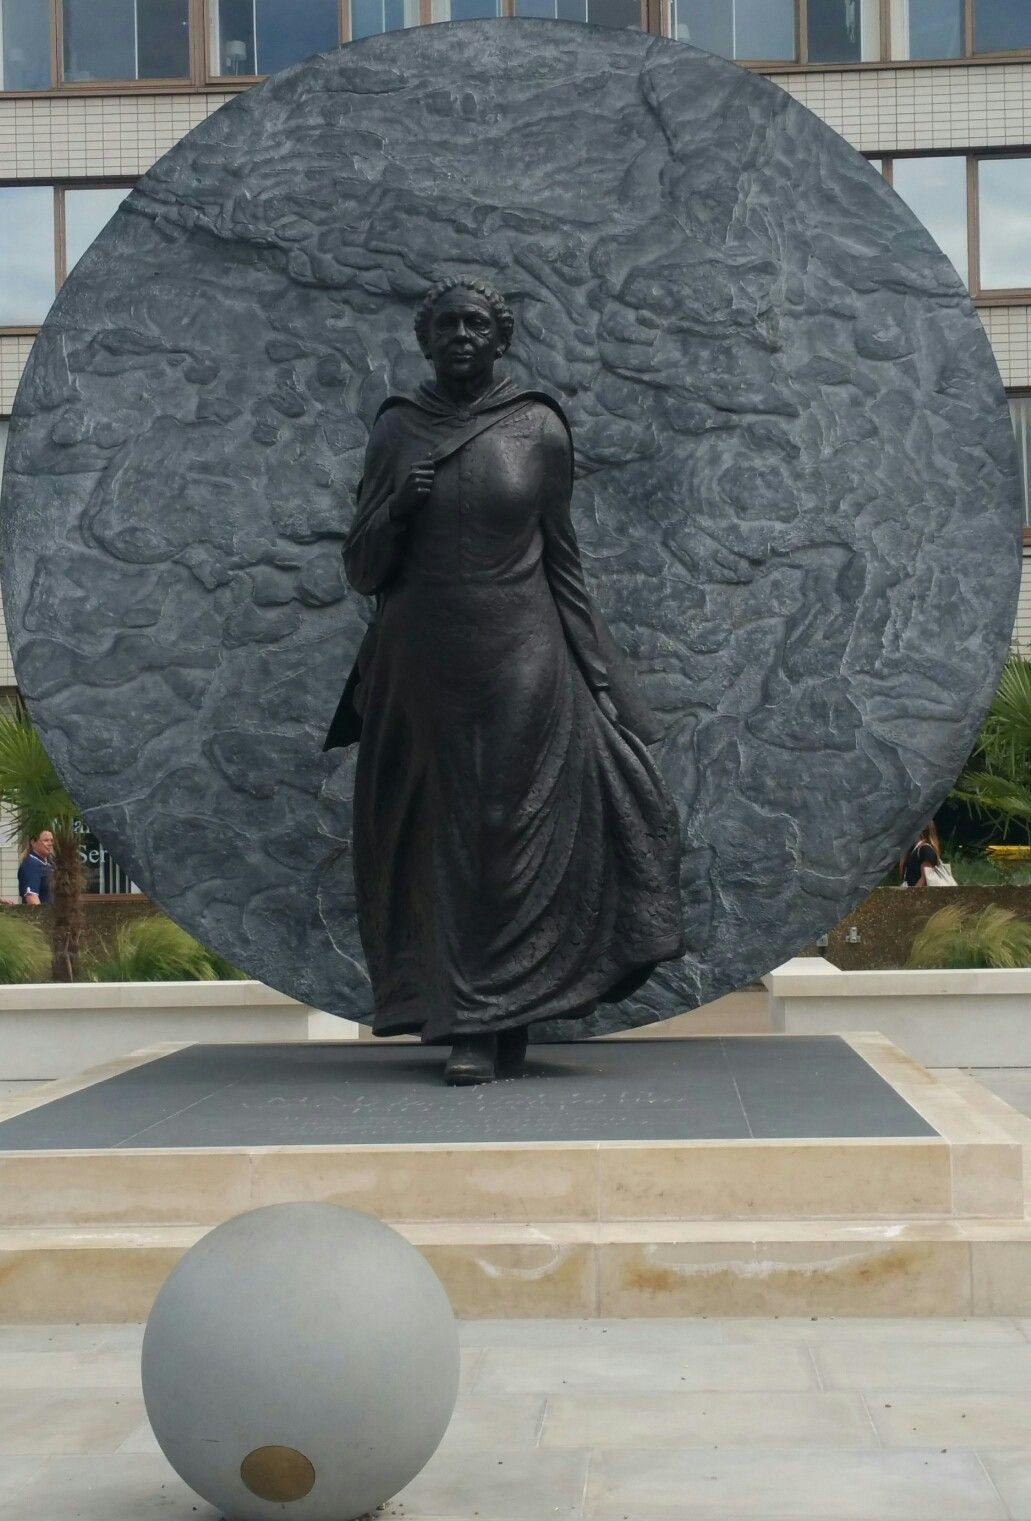 Statute of Mary SEACOLE @ St. Thomas' hospital